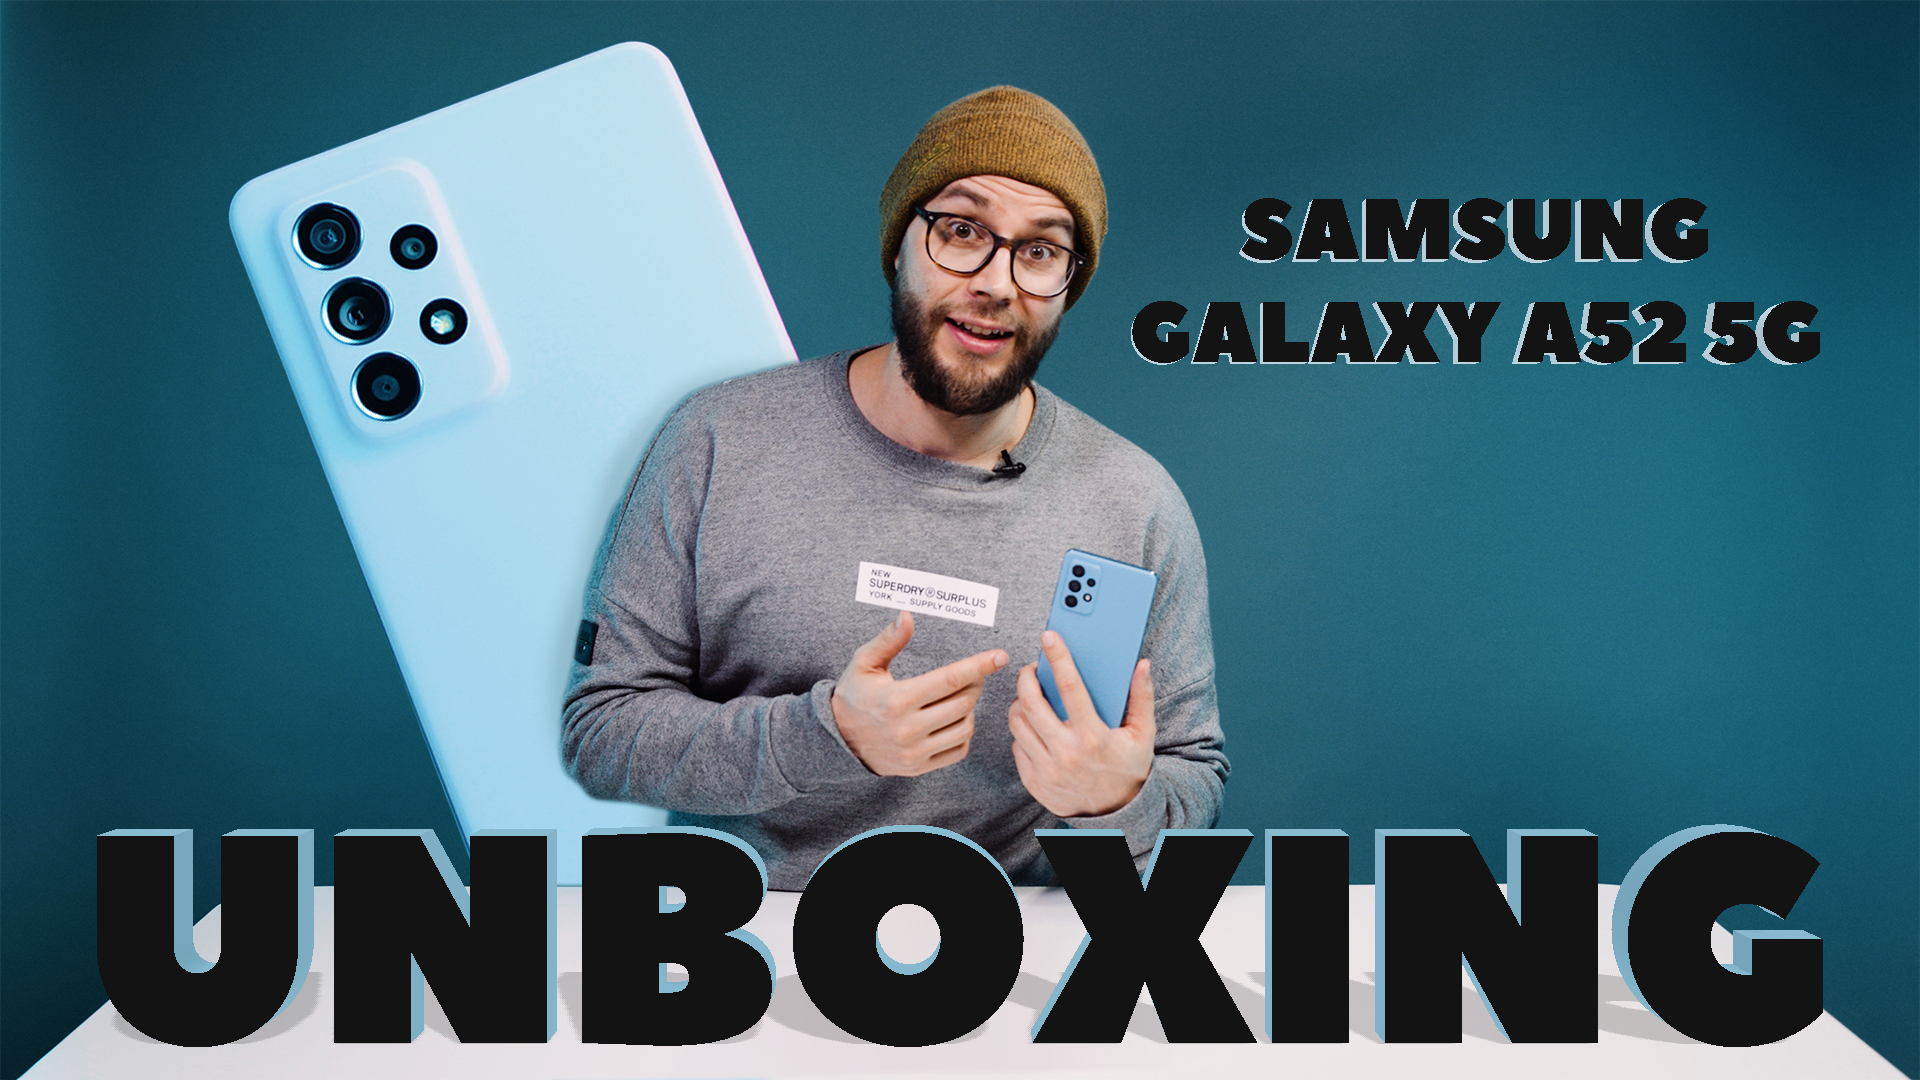 SamsungA52 UNBOXING